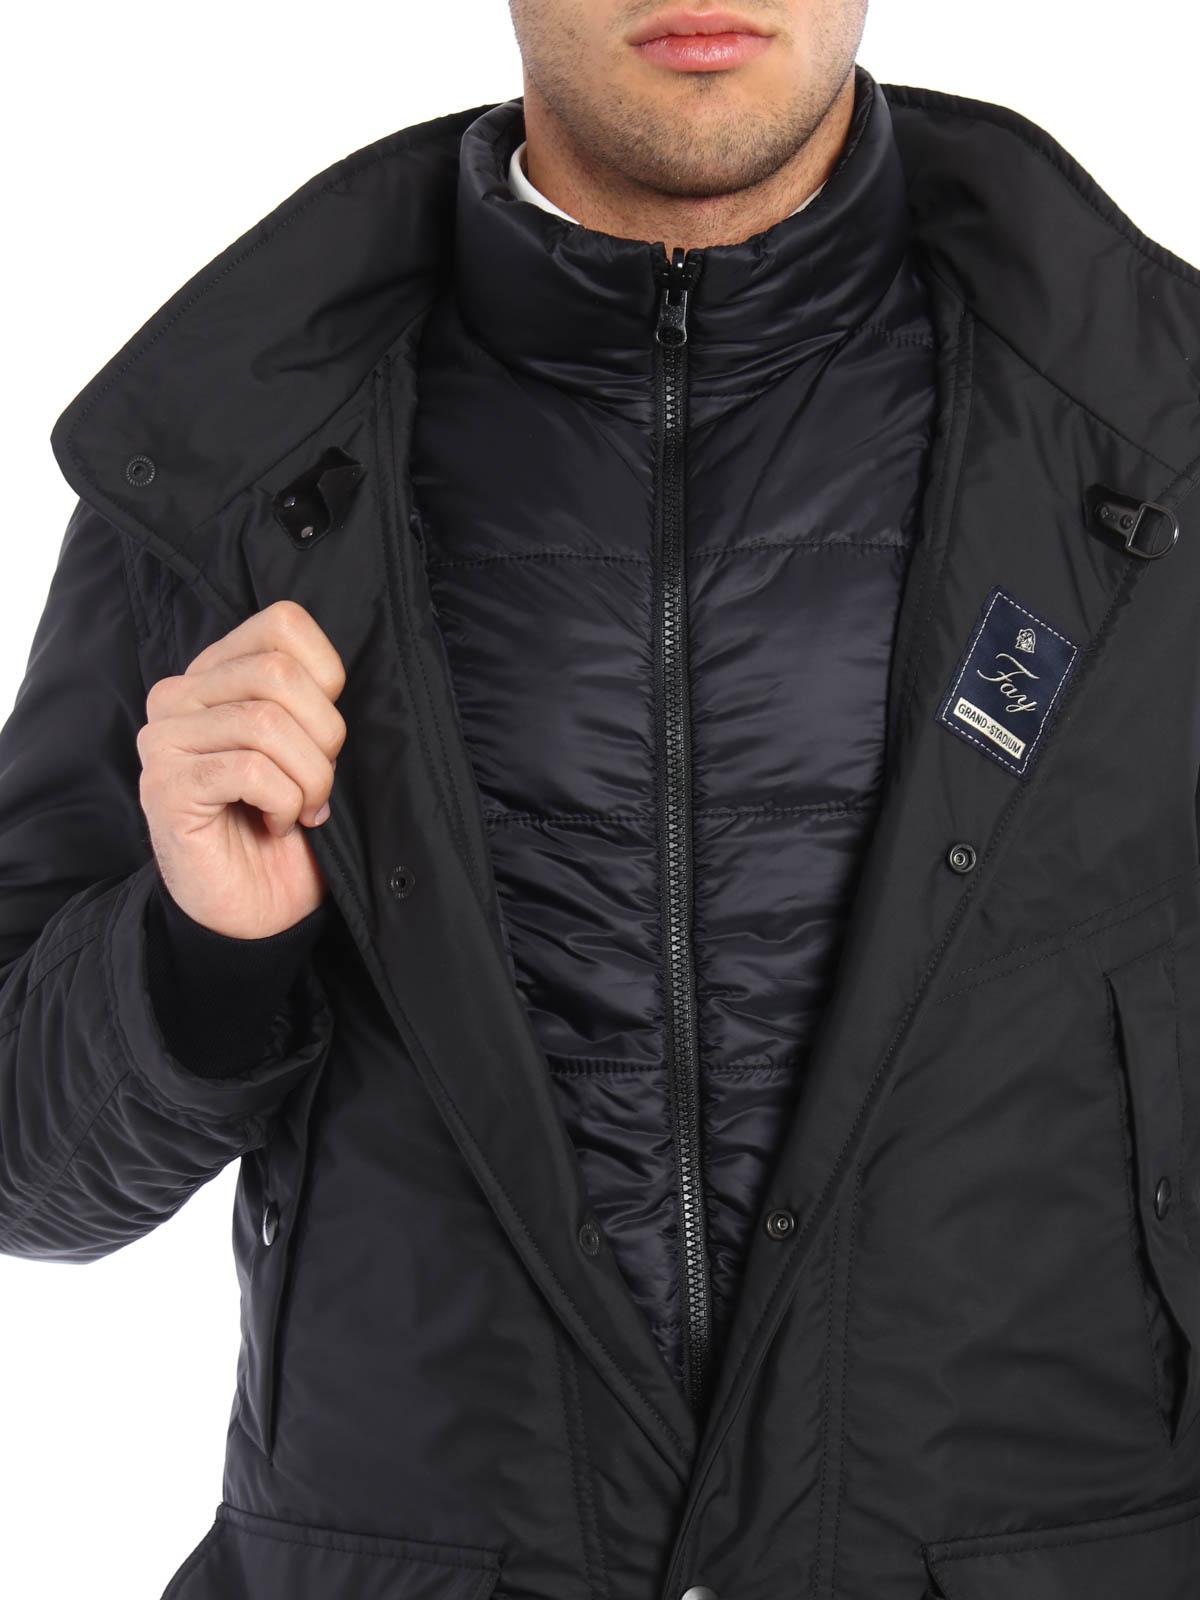 hot sale online 101dc f64a9 Fay - Nylon field jacket with waistcoat - padded jackets ...